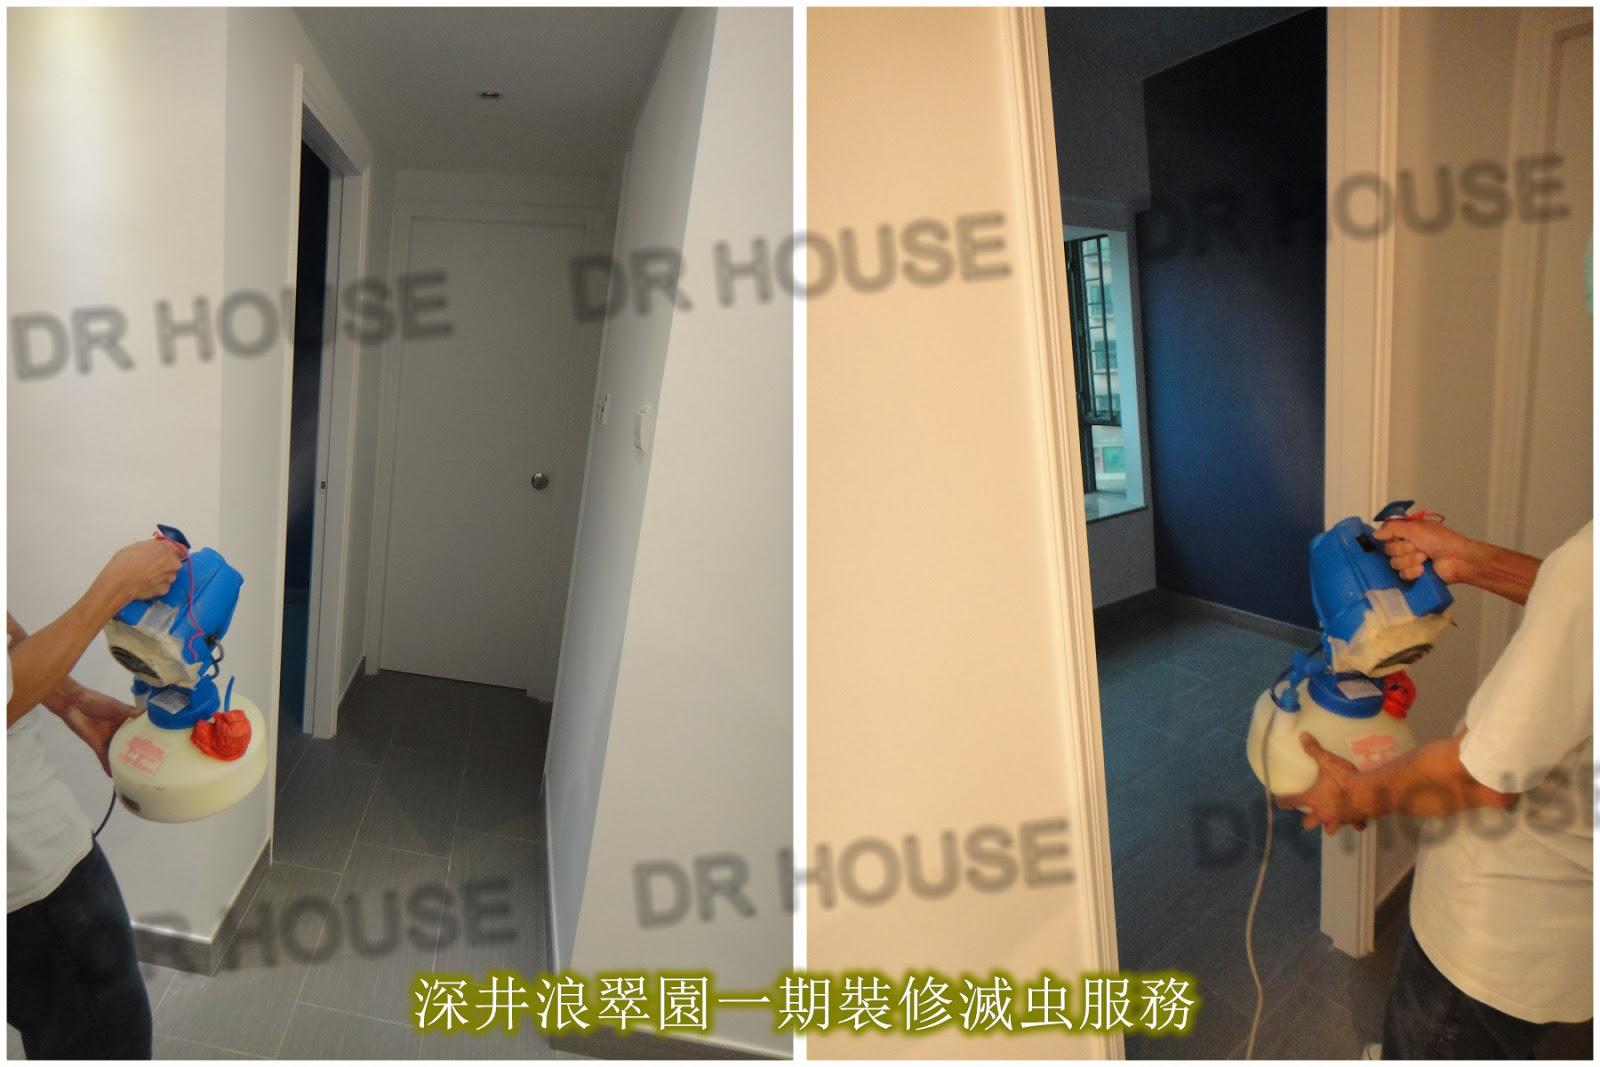 dr house & 100%意念創作室 電話:37570373 手提61752468 長沙灣長順街11號長城工業大廈211室 email: dr61752468@yahoo.com.hk: 深 ...